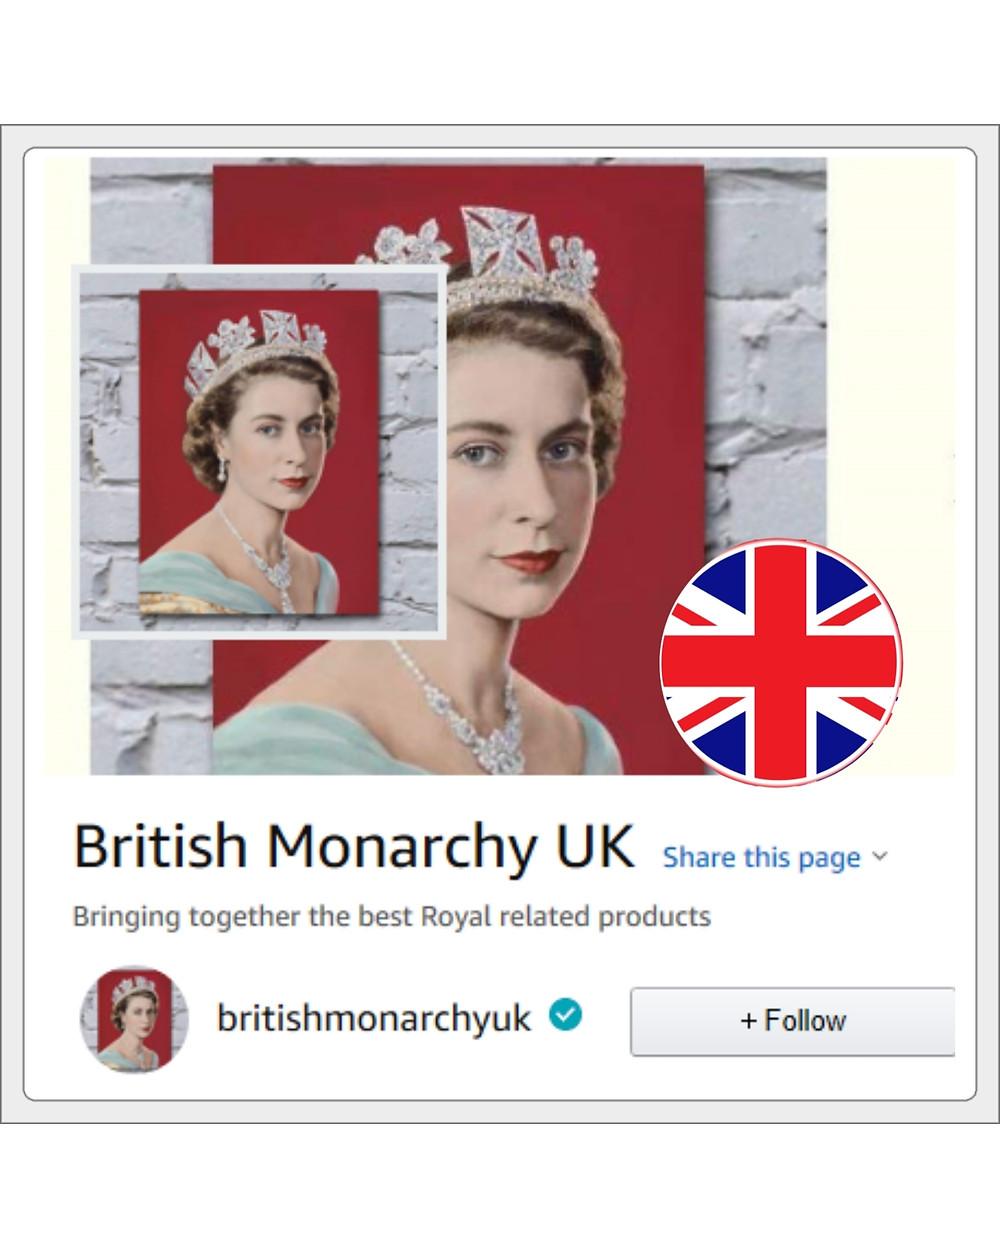 cover photo link to Britishmonarchy Amazon UK page. Queen Elizabeth II